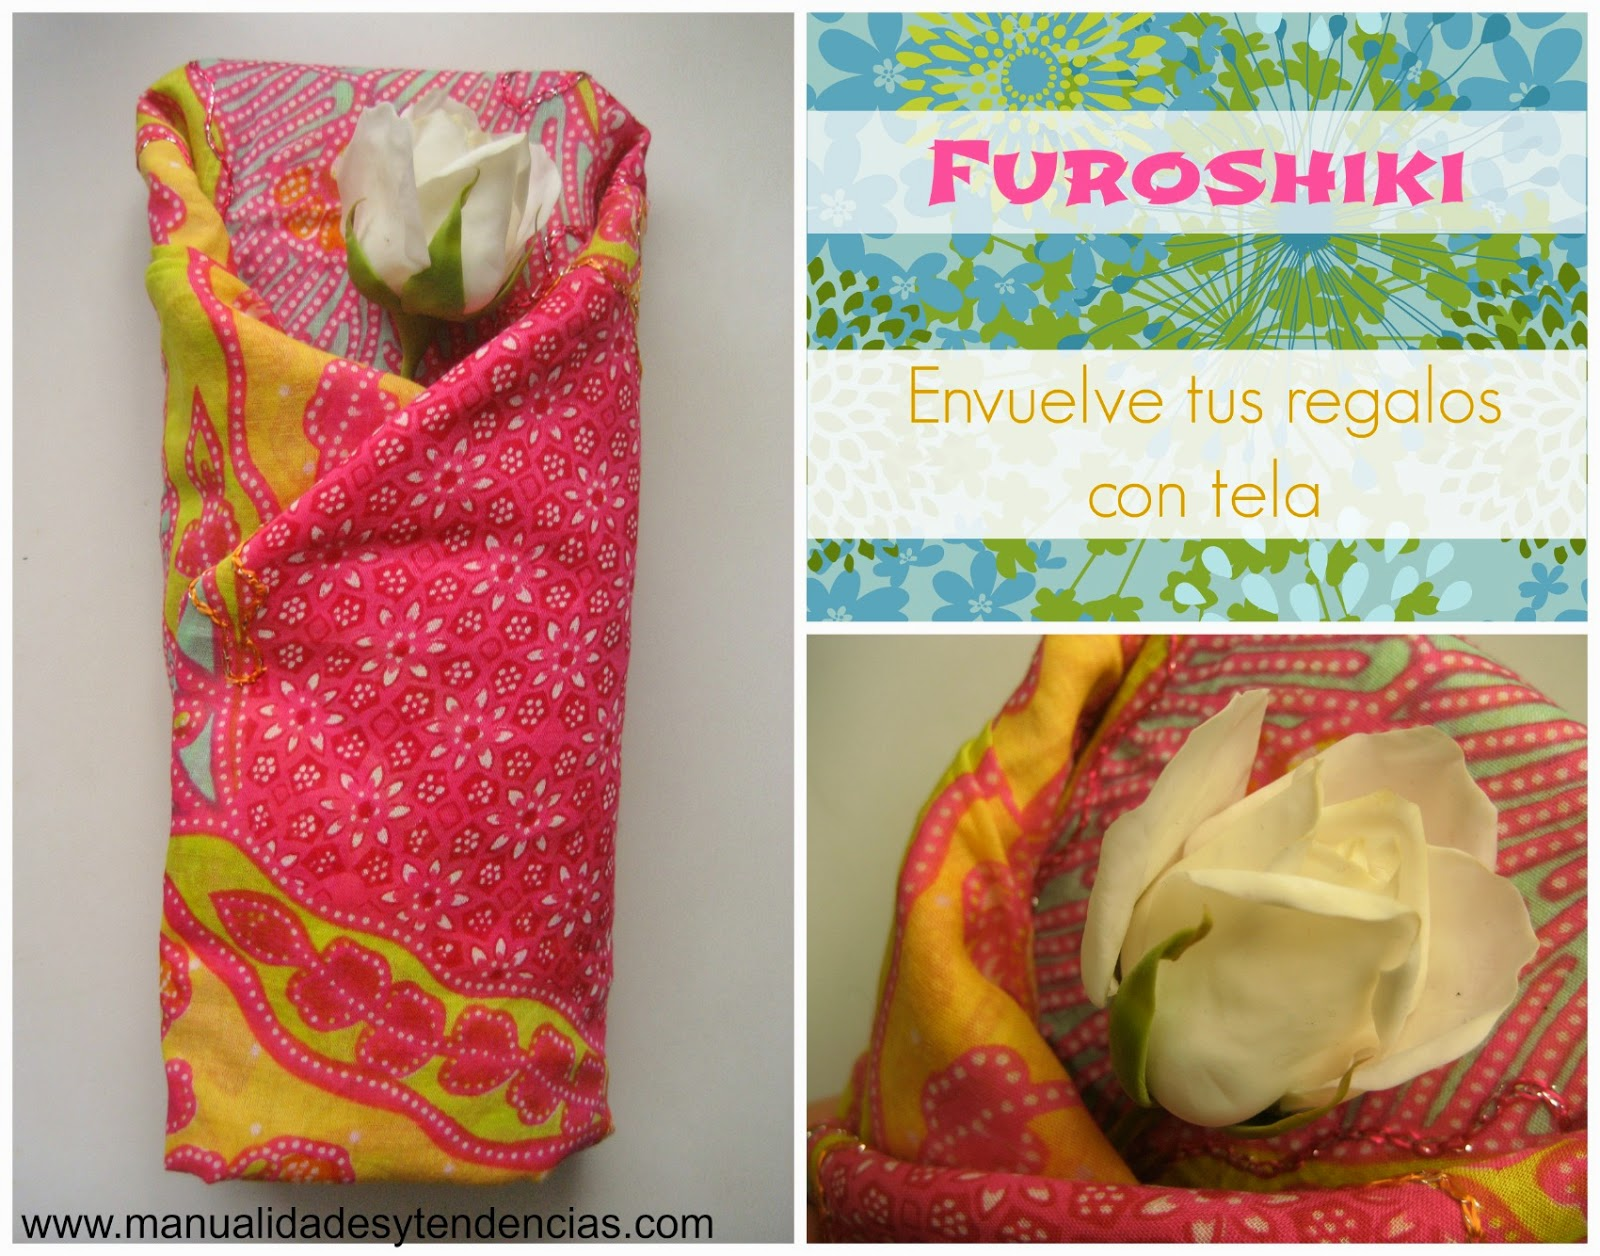 Furoshiki: cómo envoler paquetes con tela